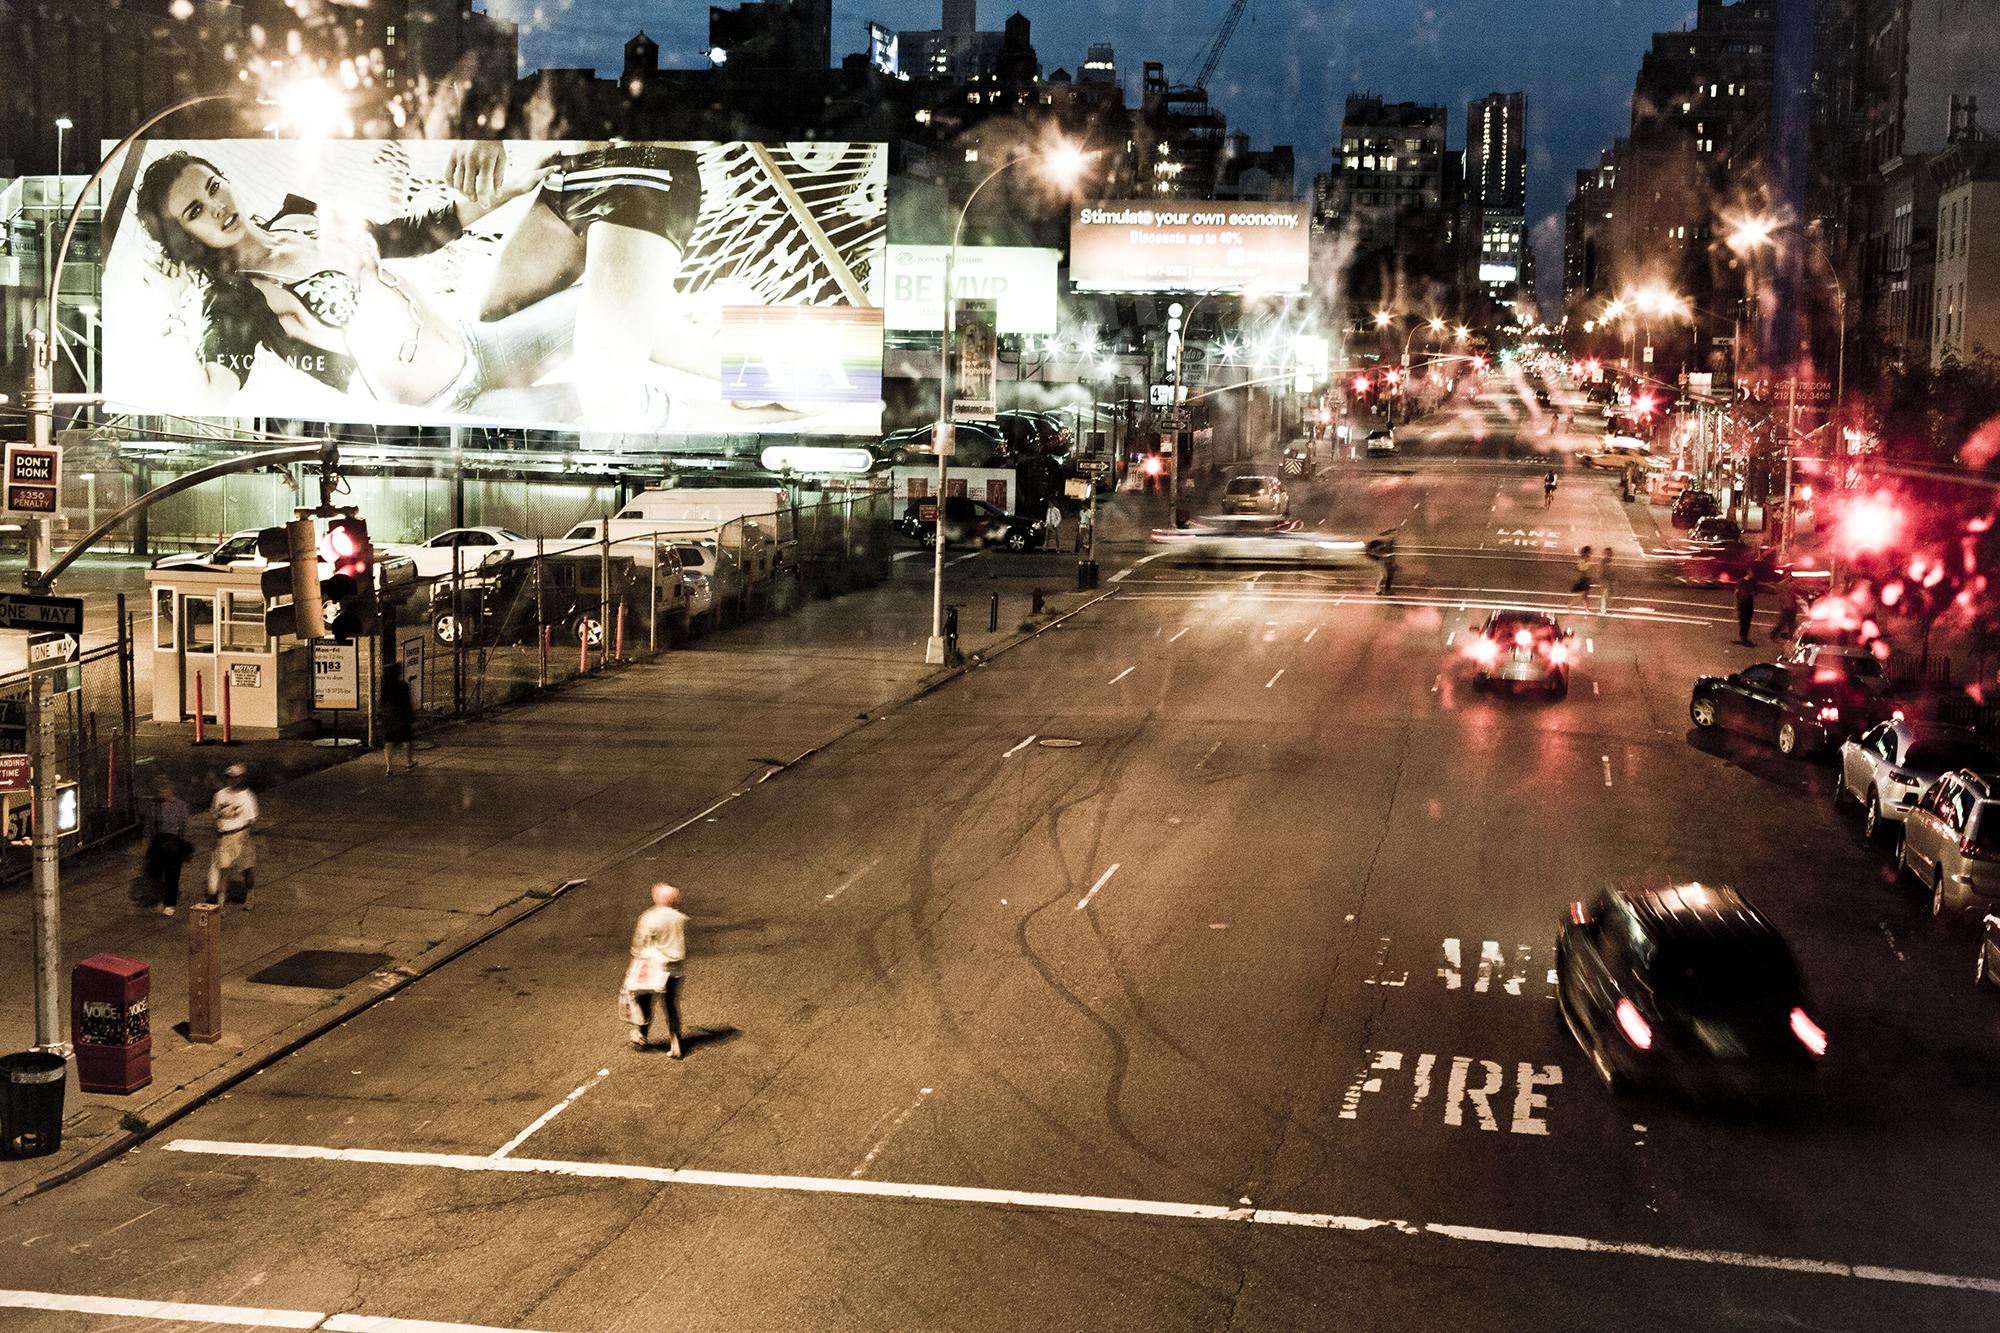 NYC_street.jpg